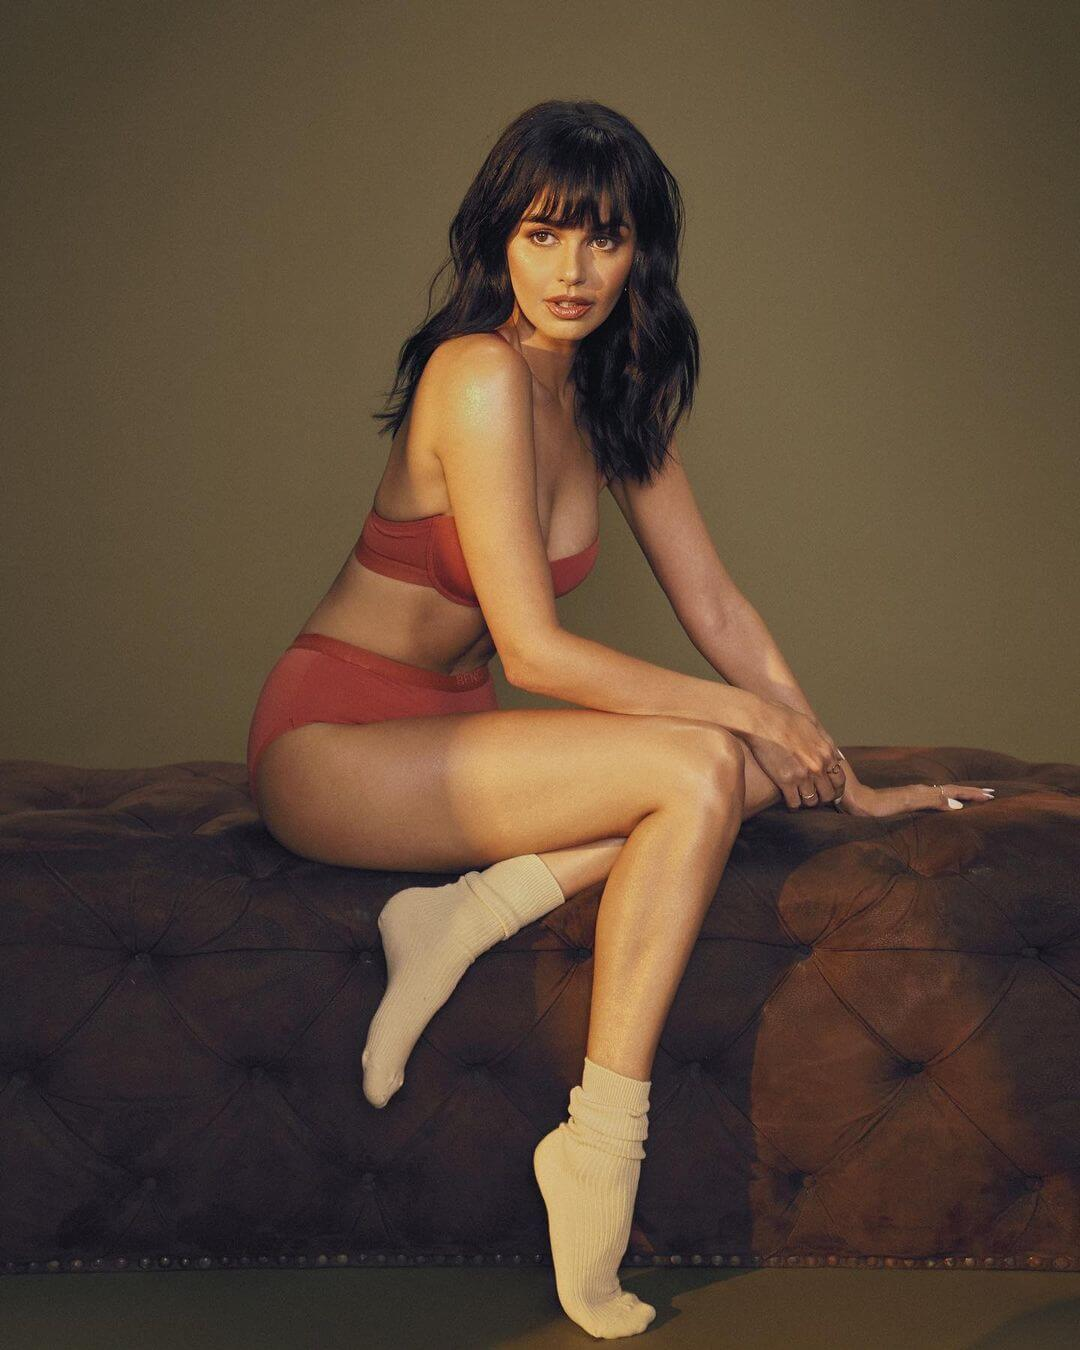 Model Janine Gutierrez In Bikini